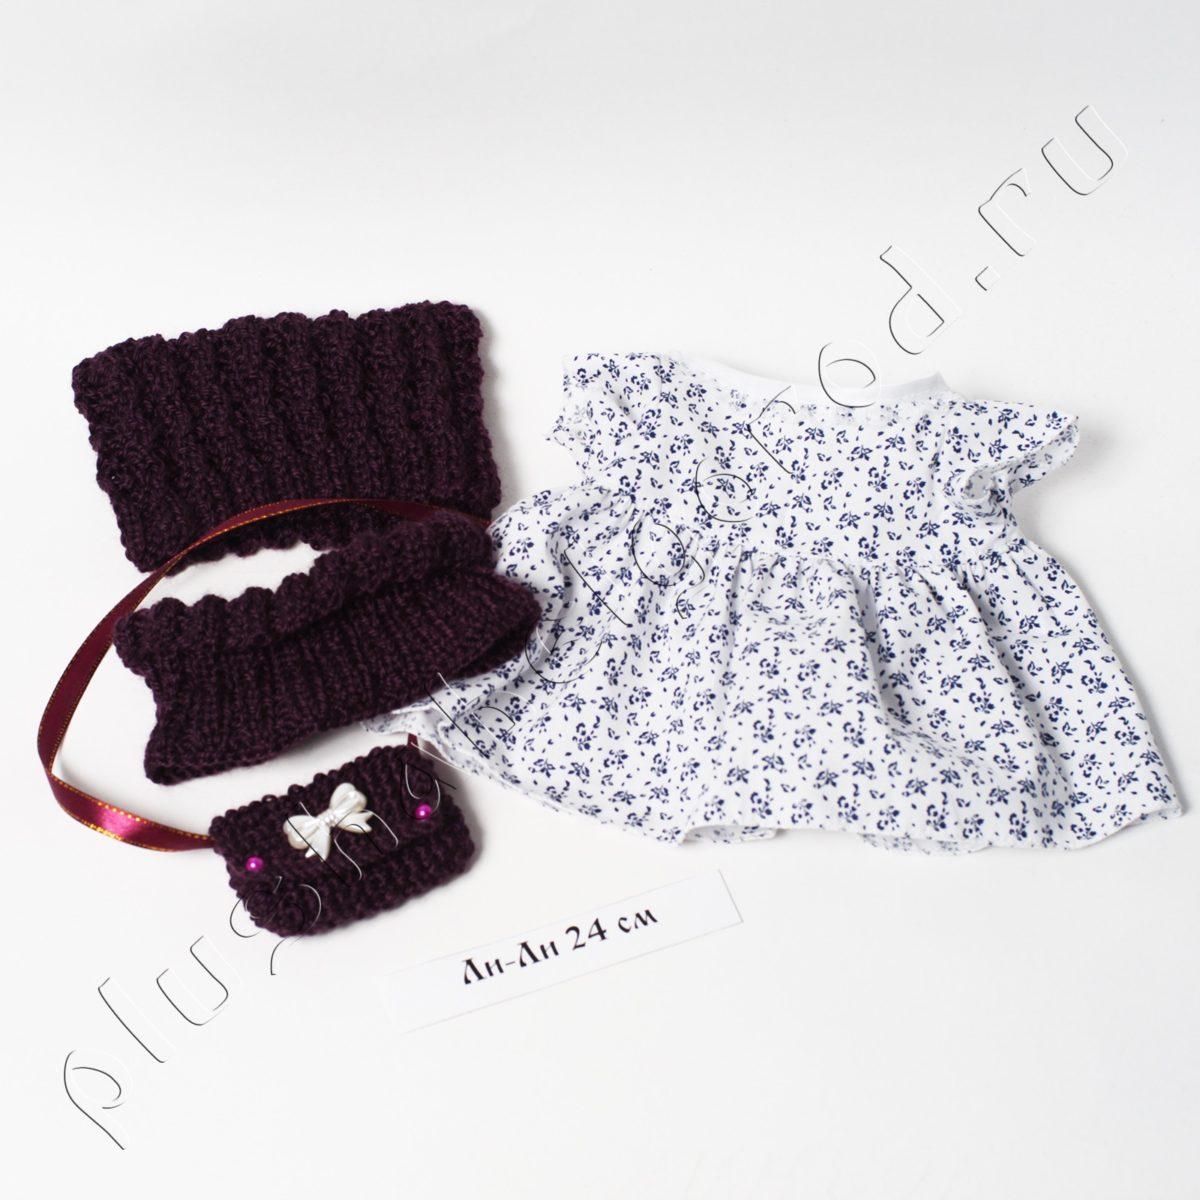 Акция! Выгода 100р.! Платье, шапочка, снуд и сумочка